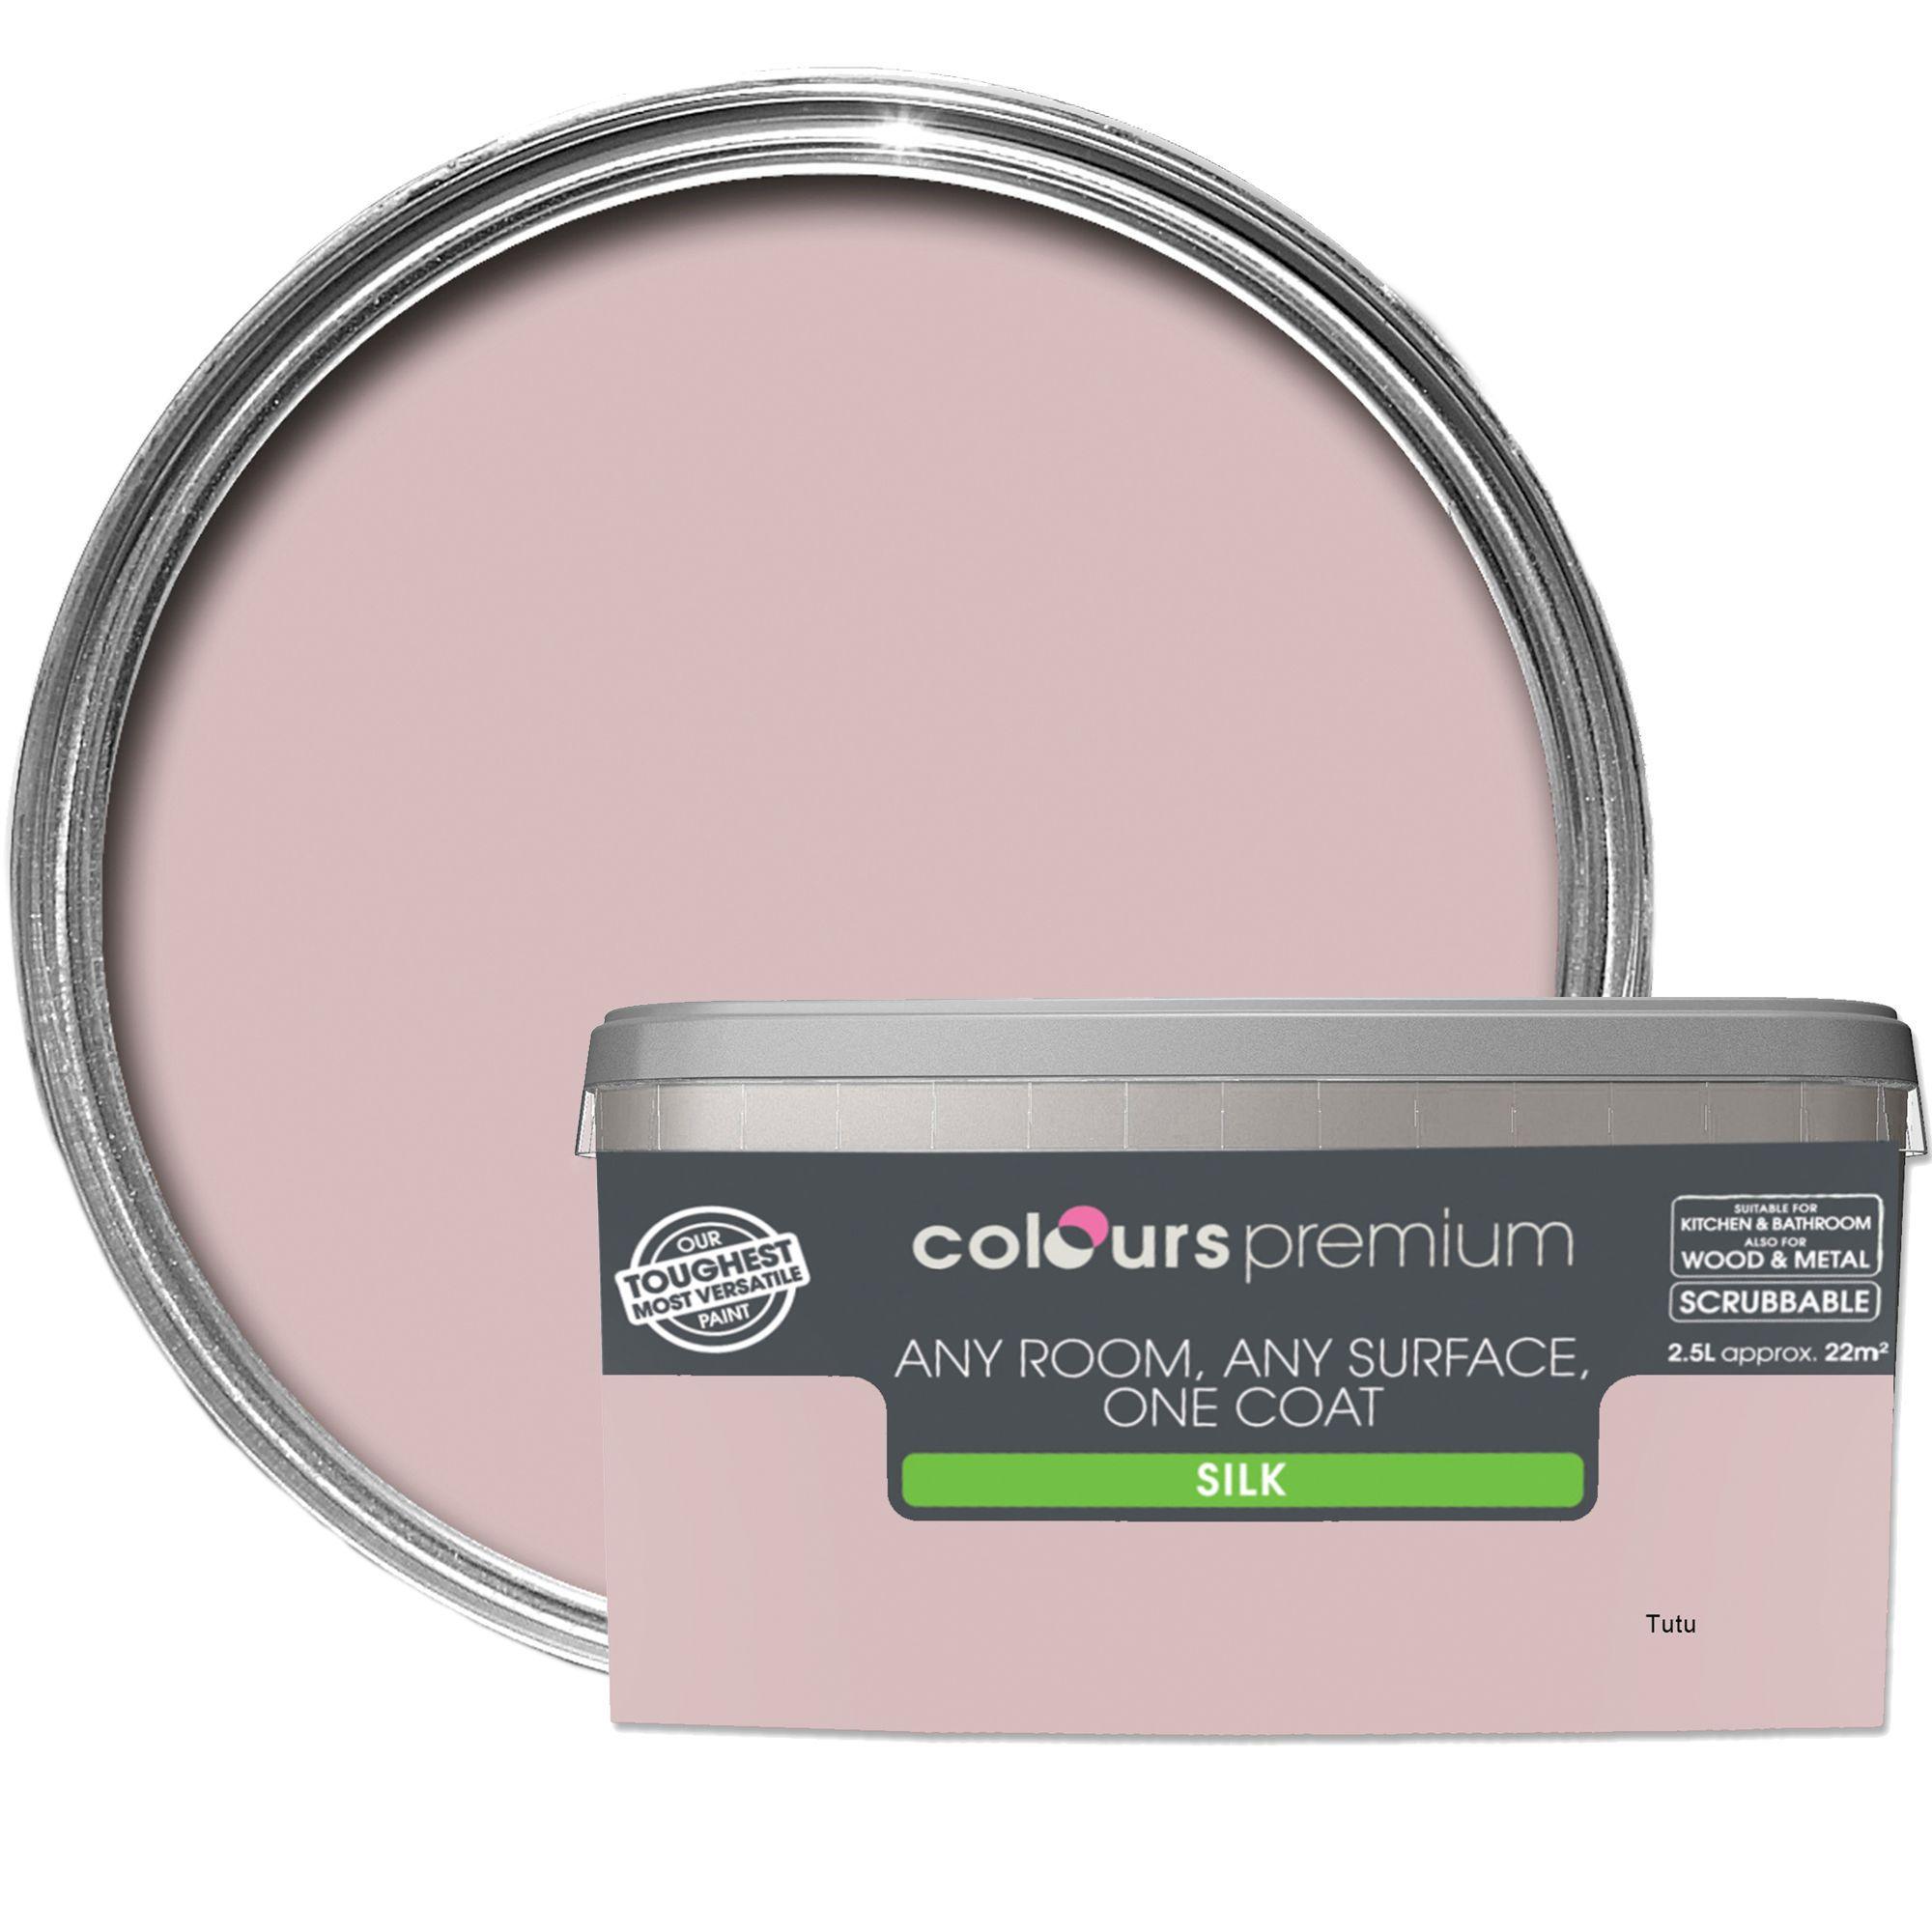 Pleasing Colours Premium Tutu Silk Emulsion Paint 2 5L Departments Diy At Bq Home Interior And Landscaping Spoatsignezvosmurscom